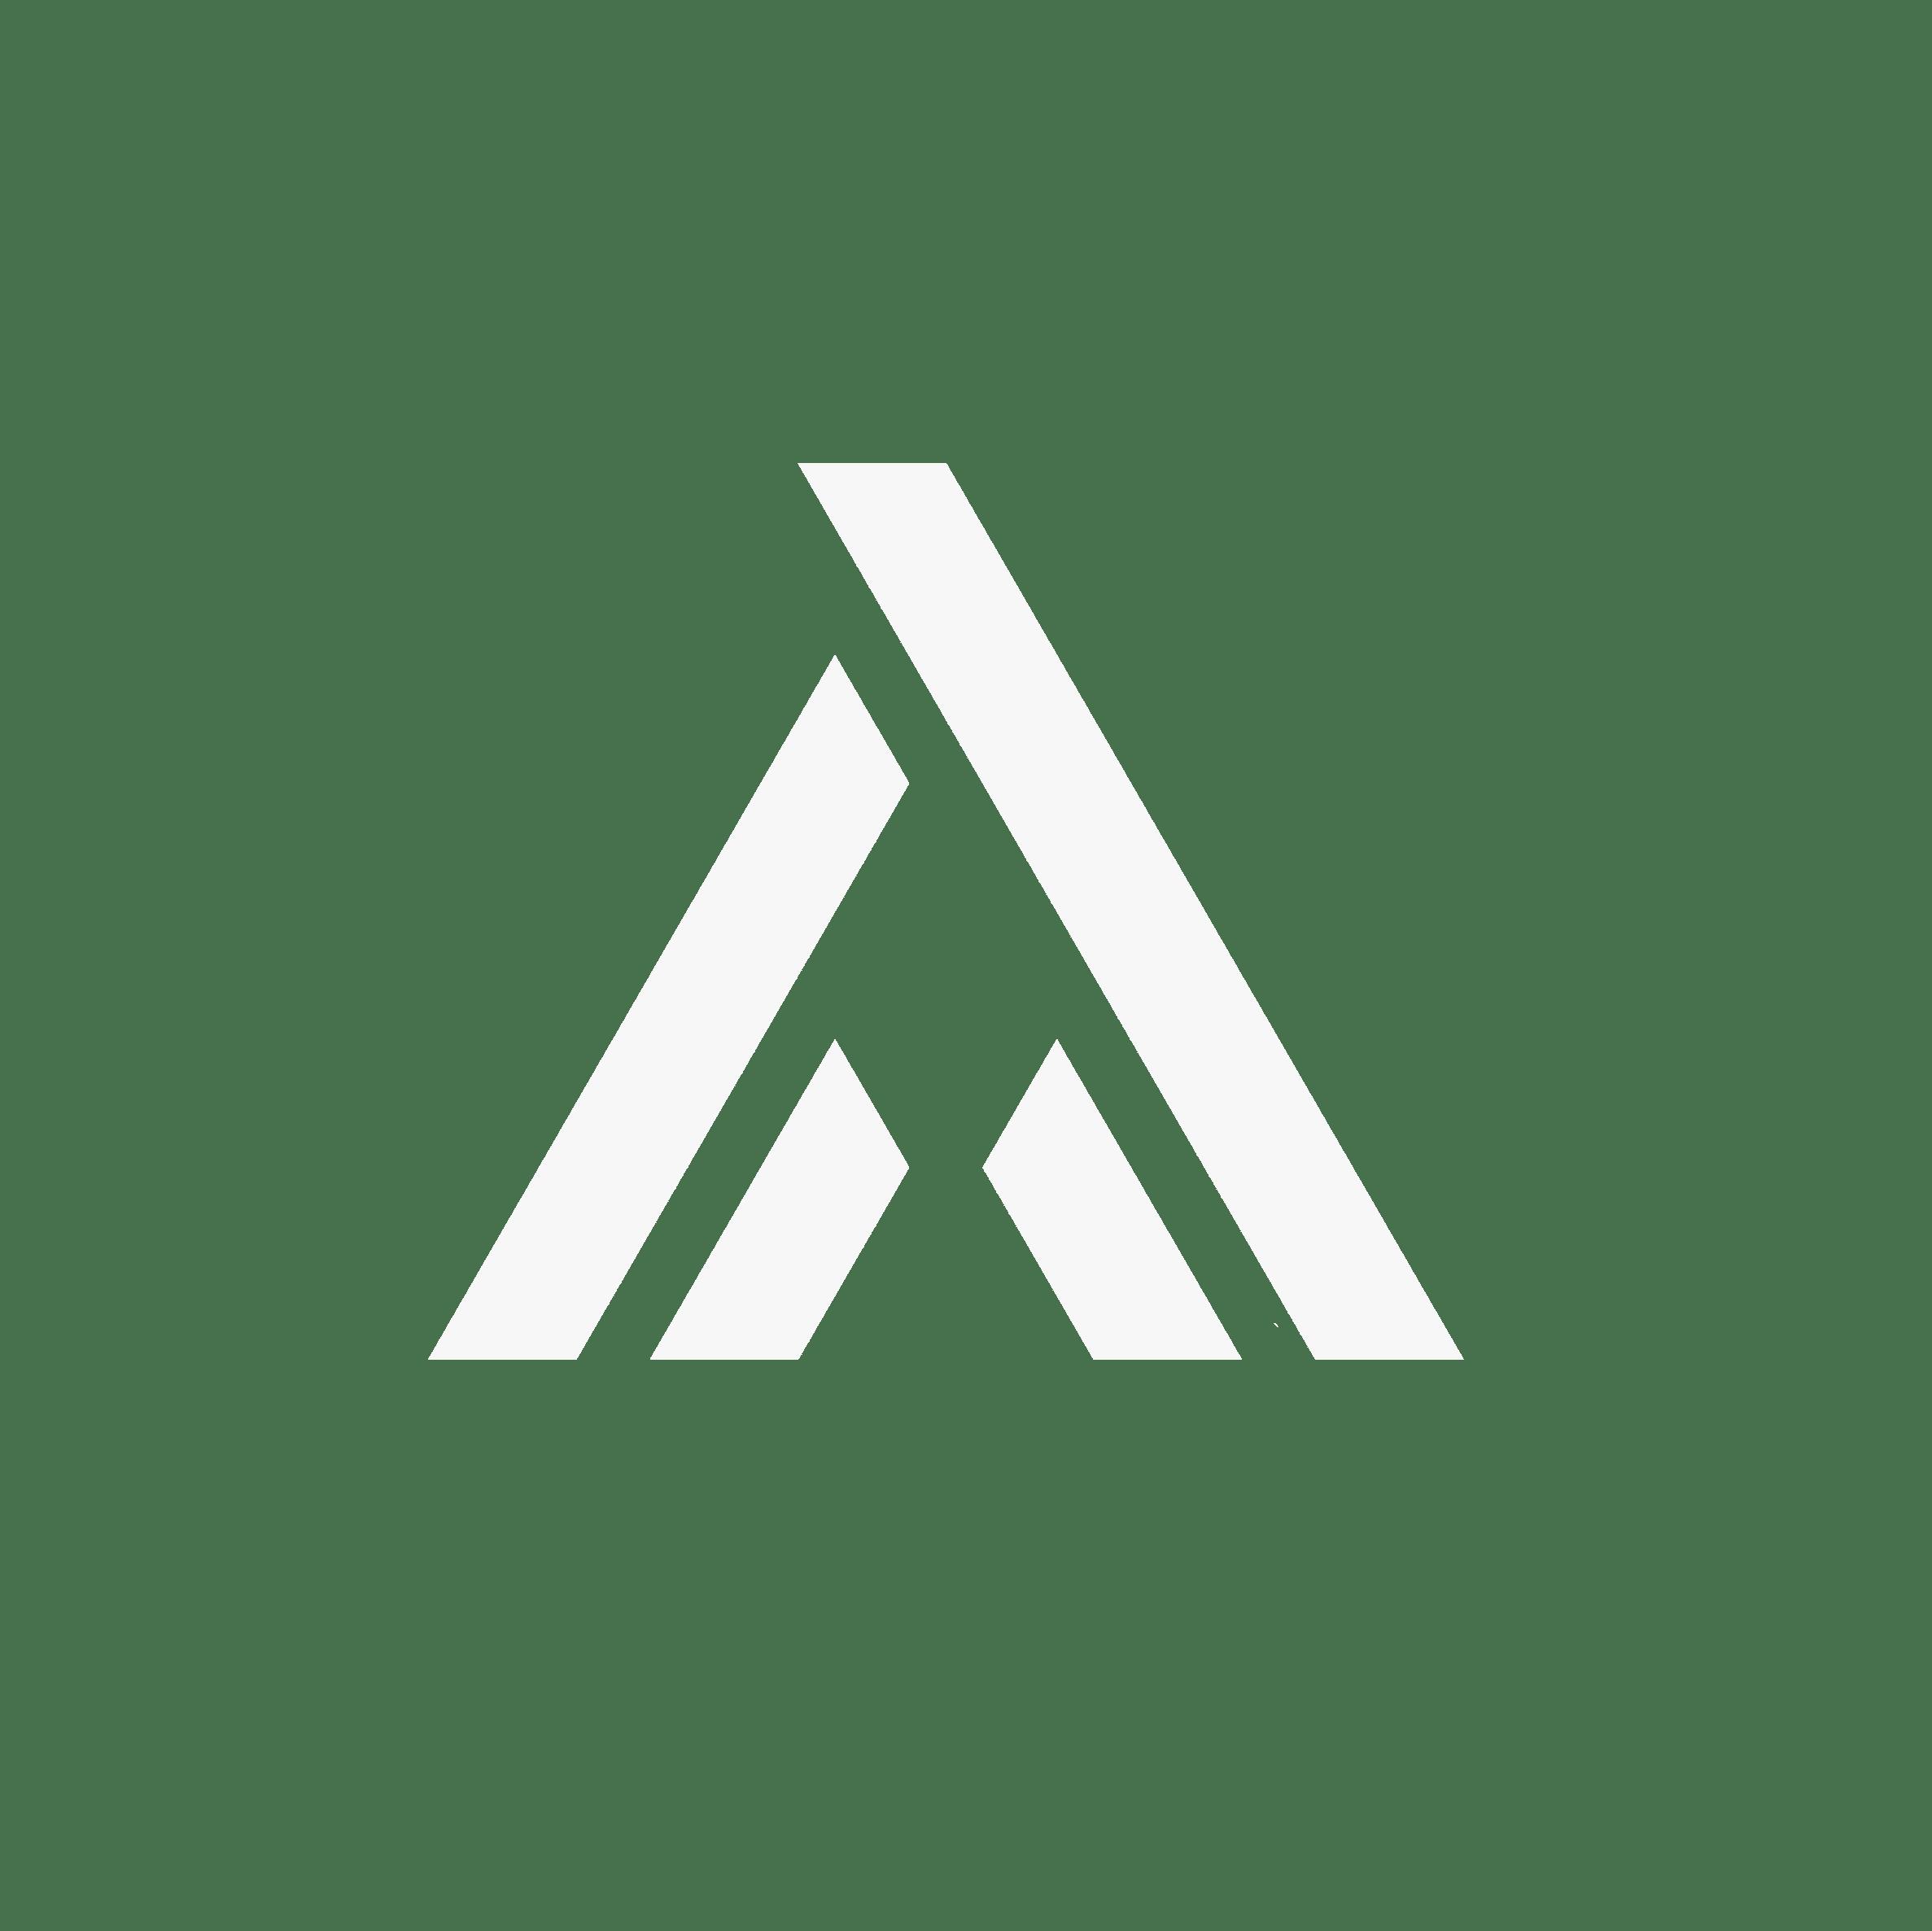 adfinis_logo_vaj_1-08